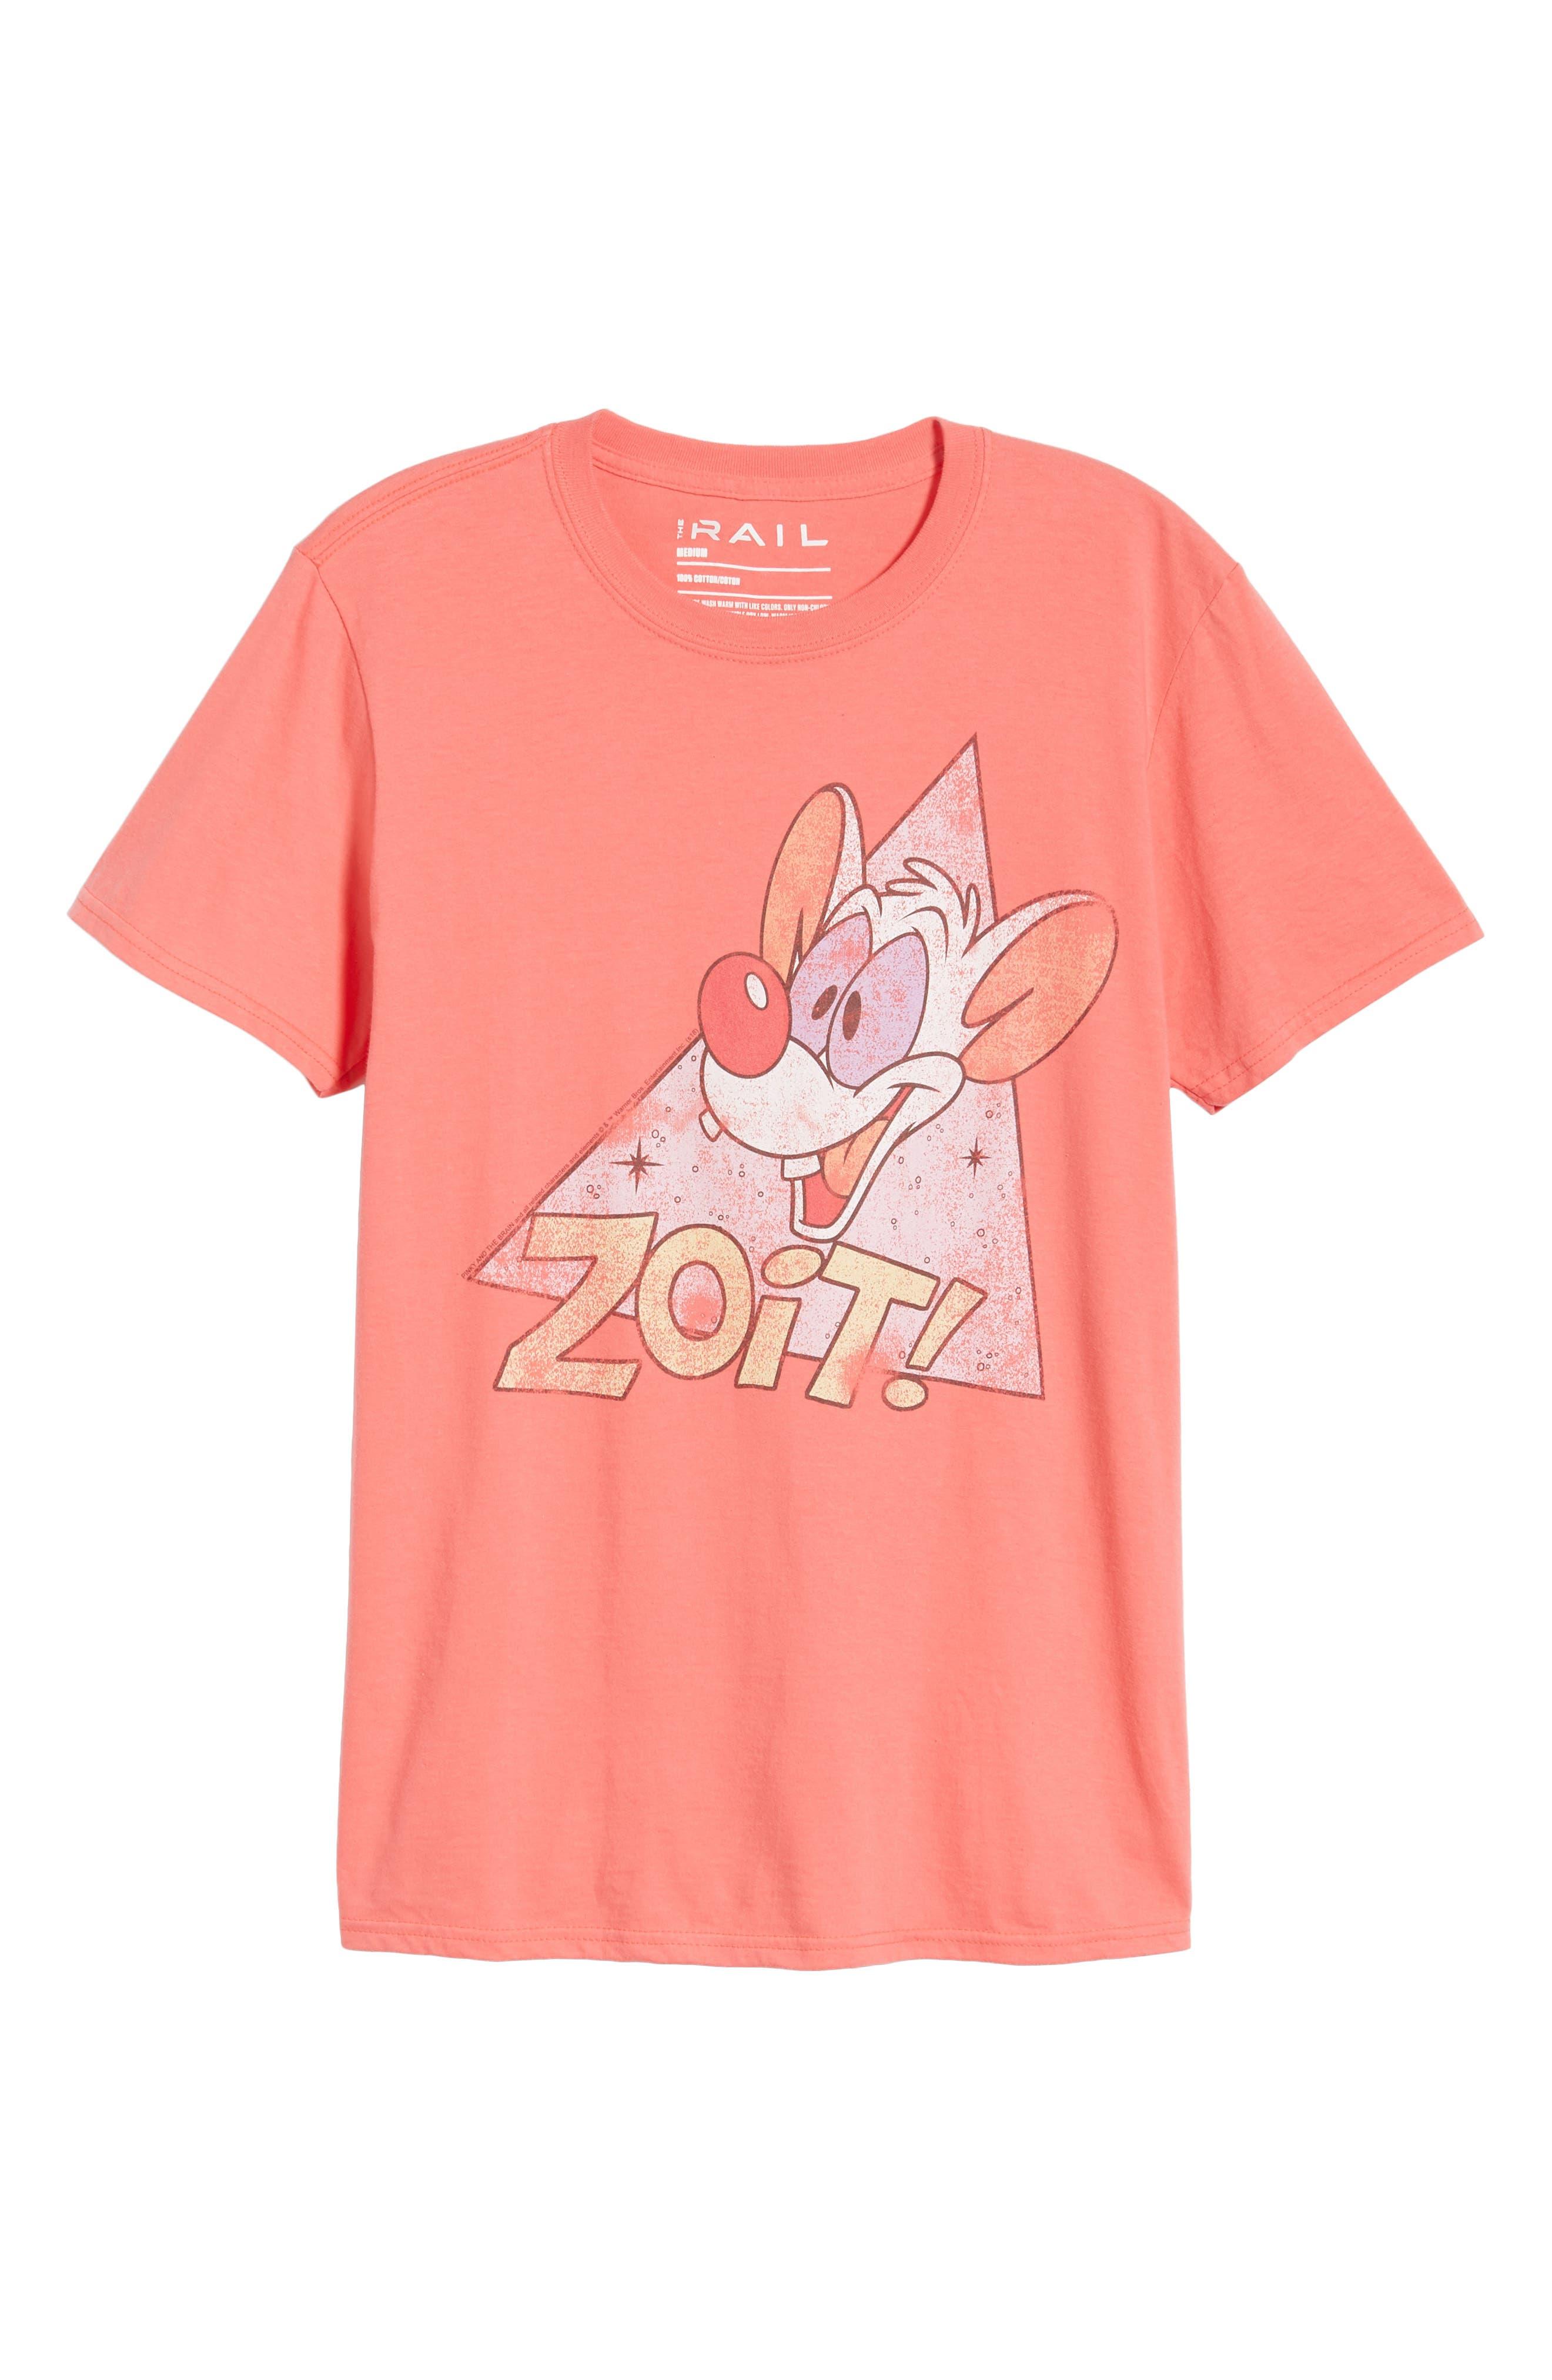 Zoit Graphic T-Shirt,                             Alternate thumbnail 6, color,                             CORAL ZOIT